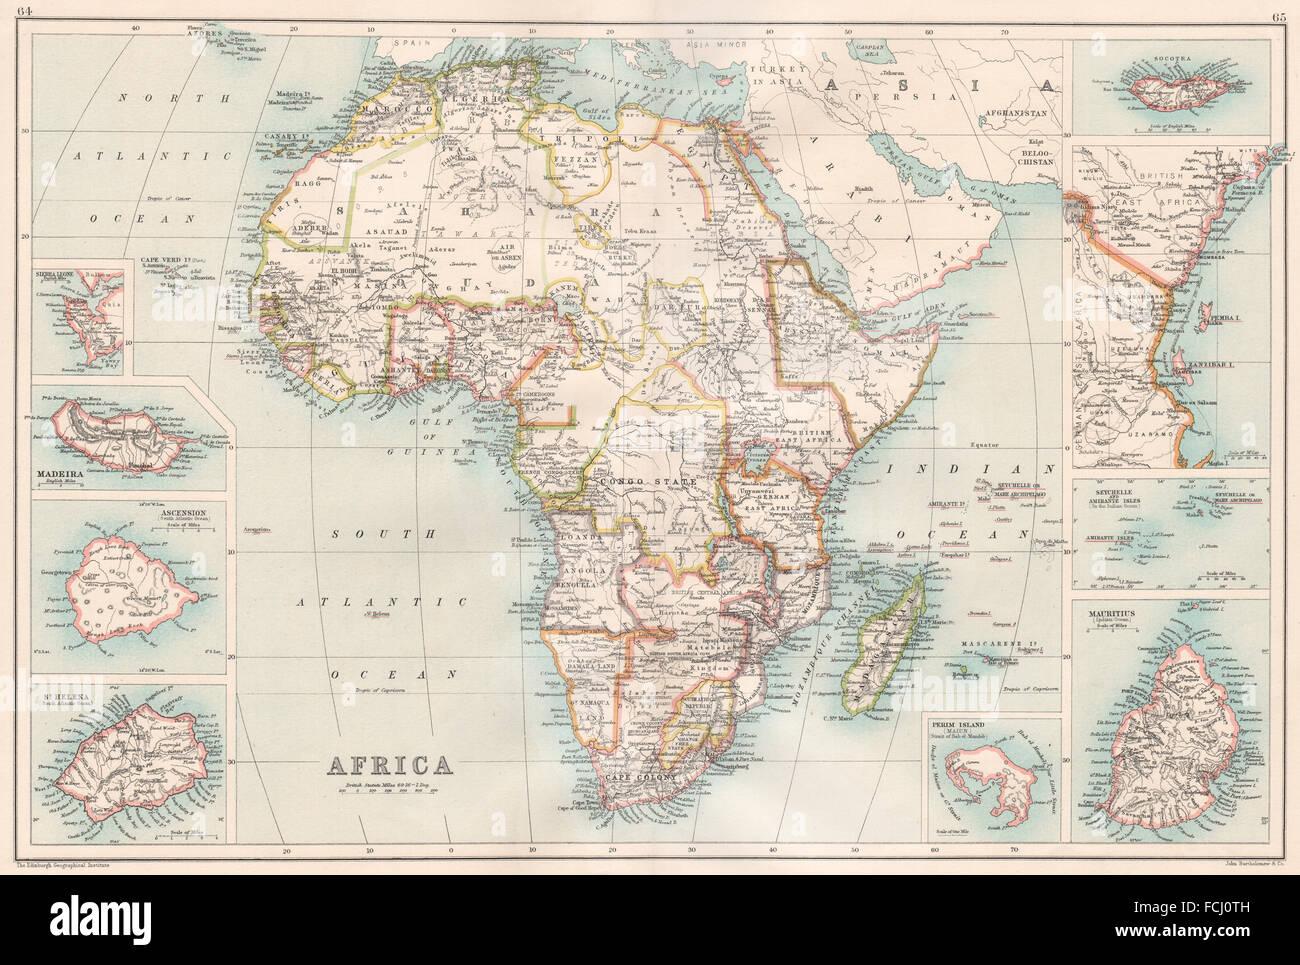 Africa Islas Santa Helena Madeira Socotra Zanzibar